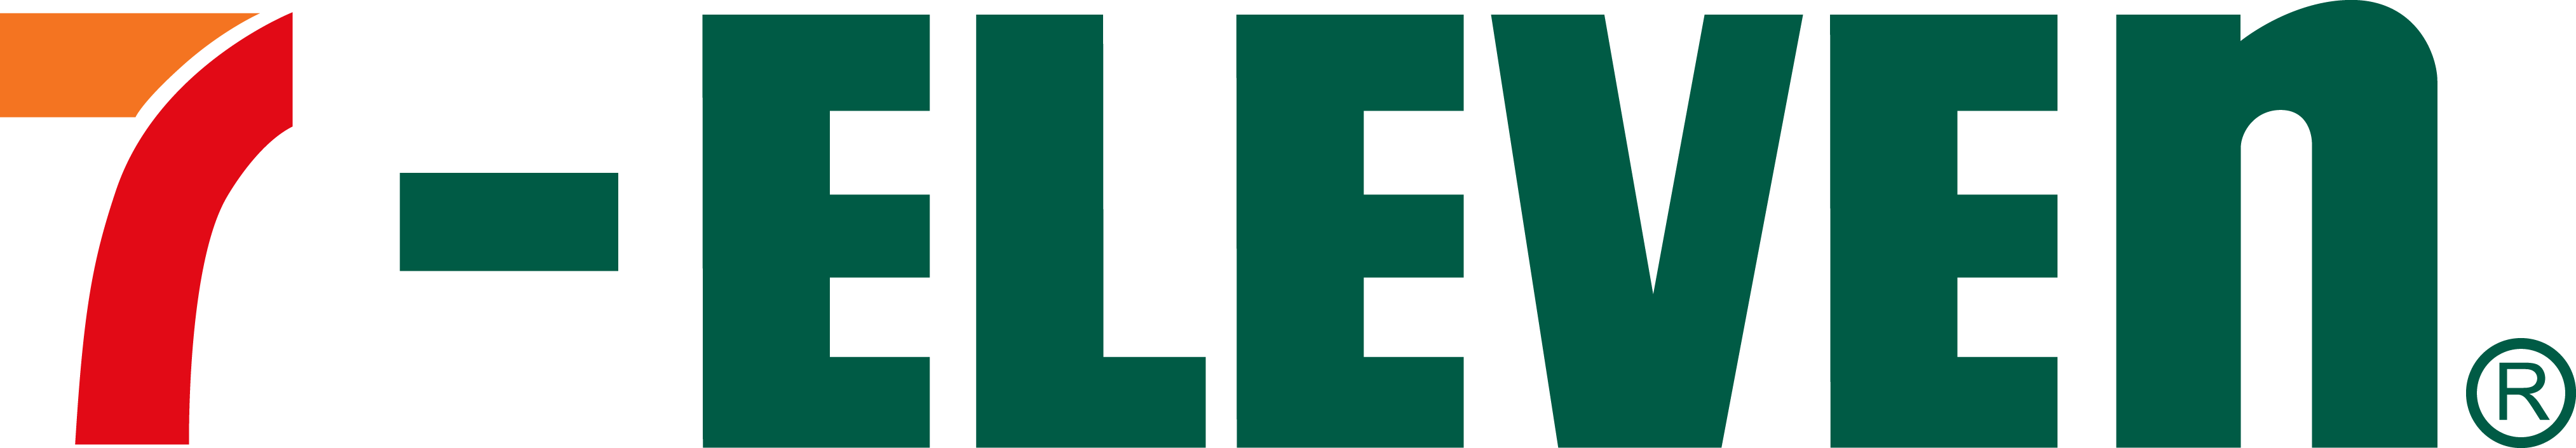 7 Eleven Logo Png